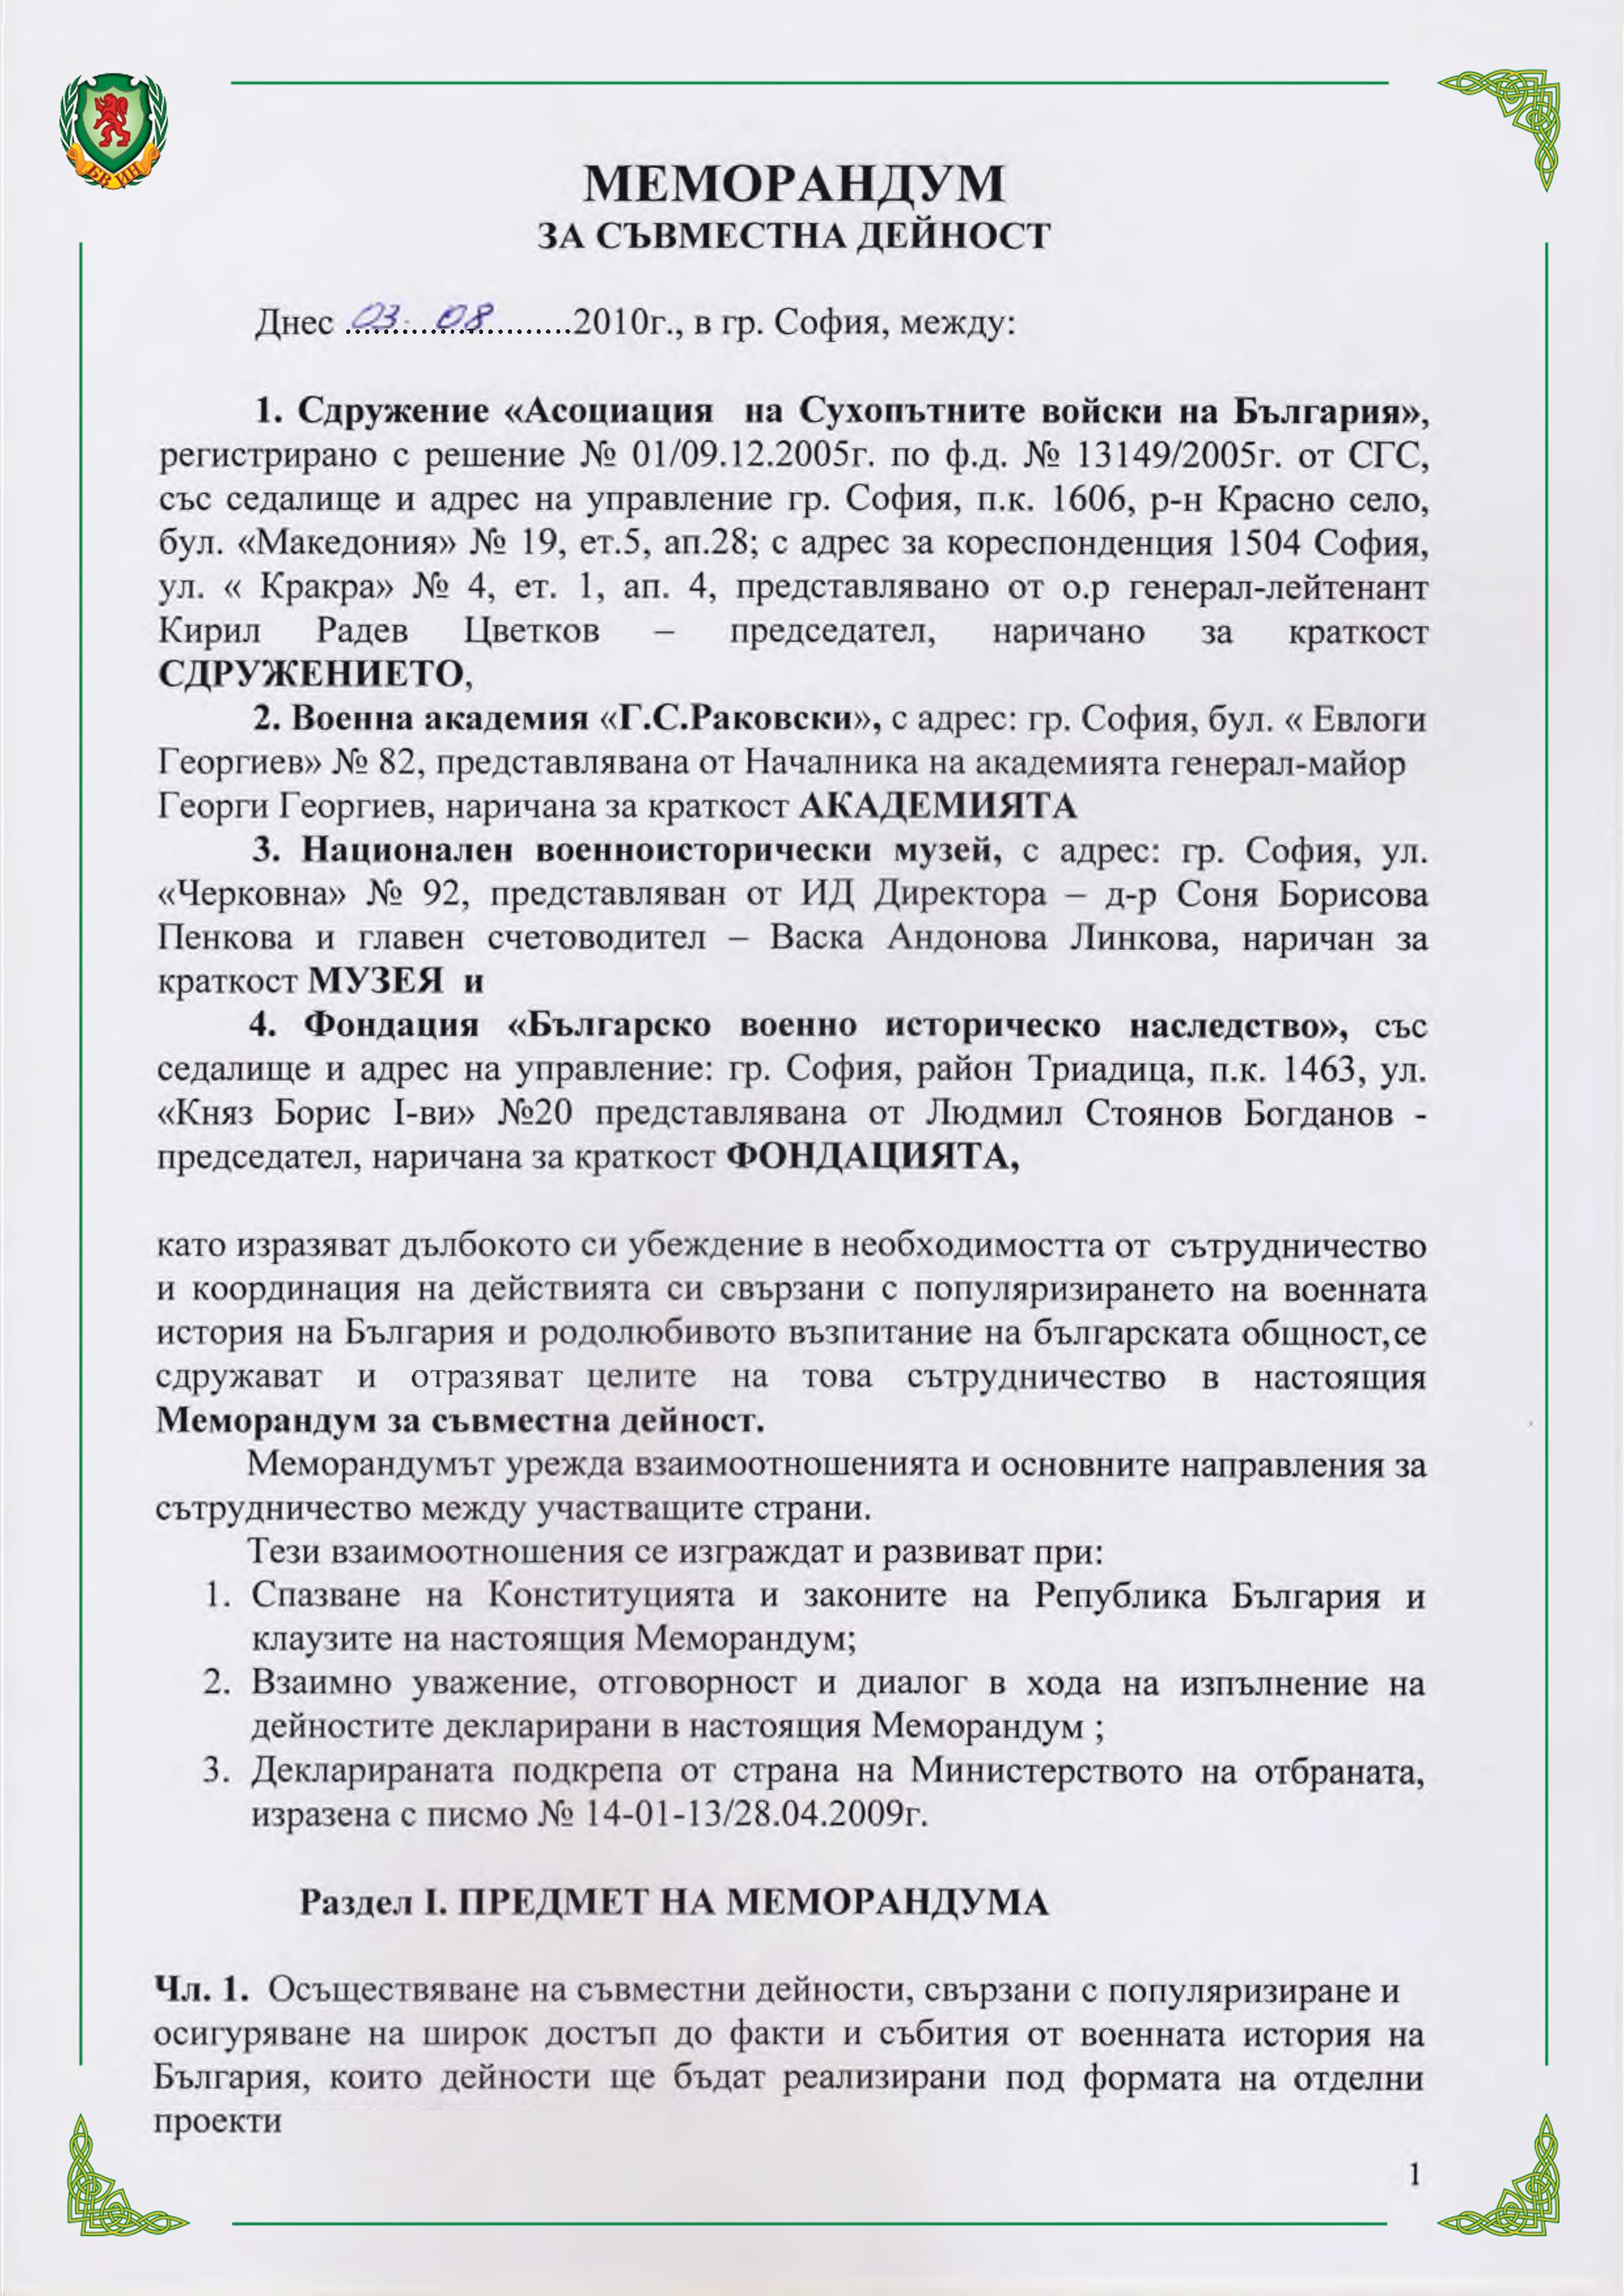 memorandum_pdf_1_CORRECTED